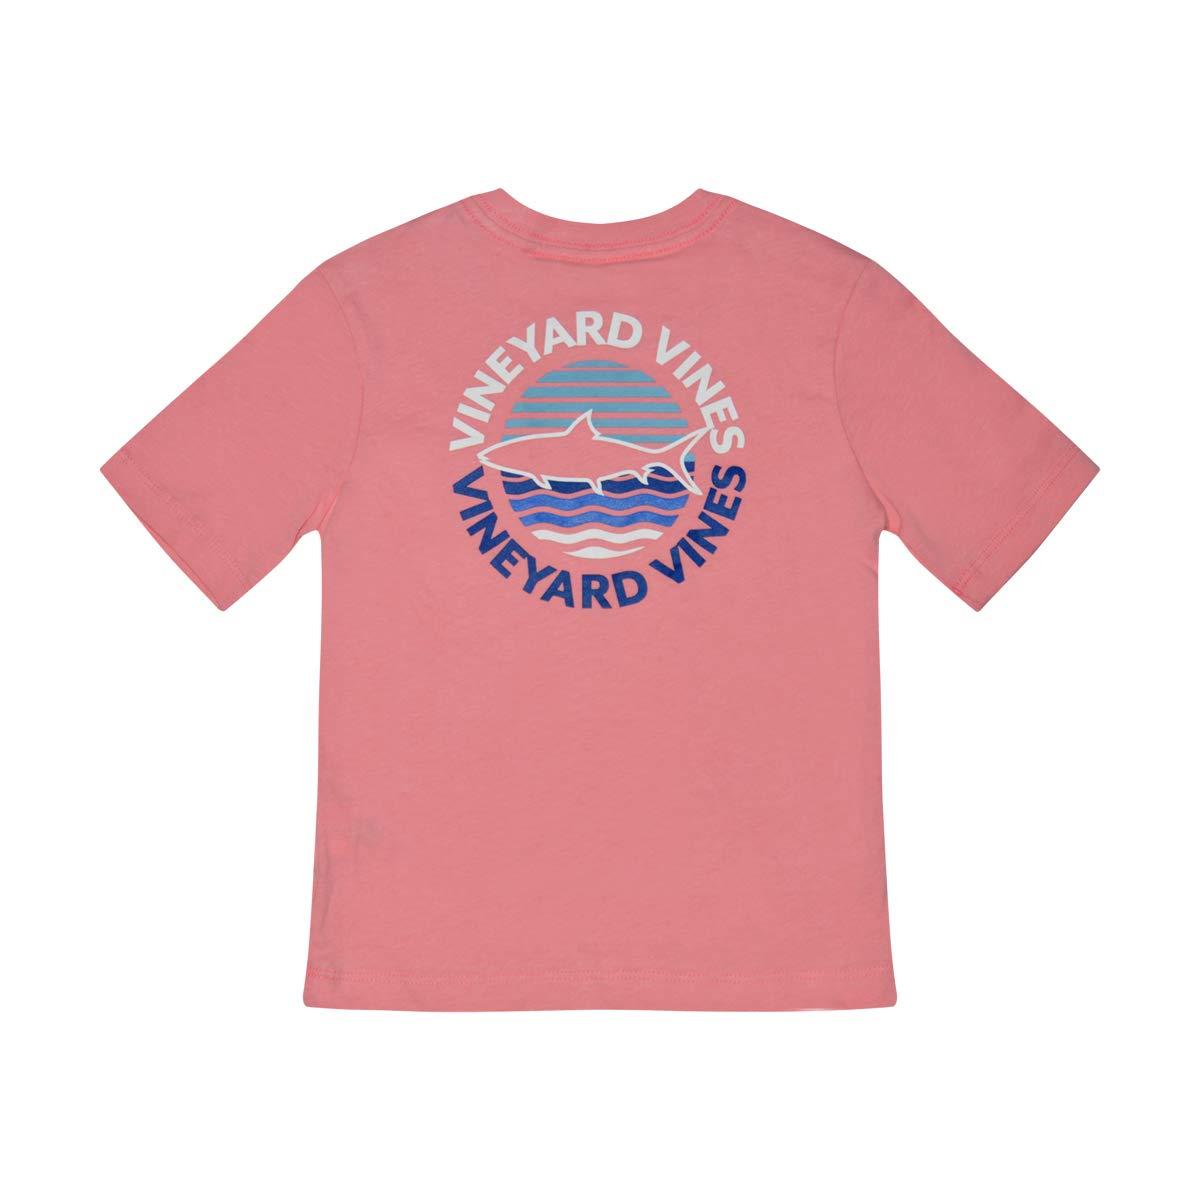 Vineyard Vines Boys Short Sleeve Graphic Pocket T-Shirt (Small, Strawberry Blonde Sunset Dot)